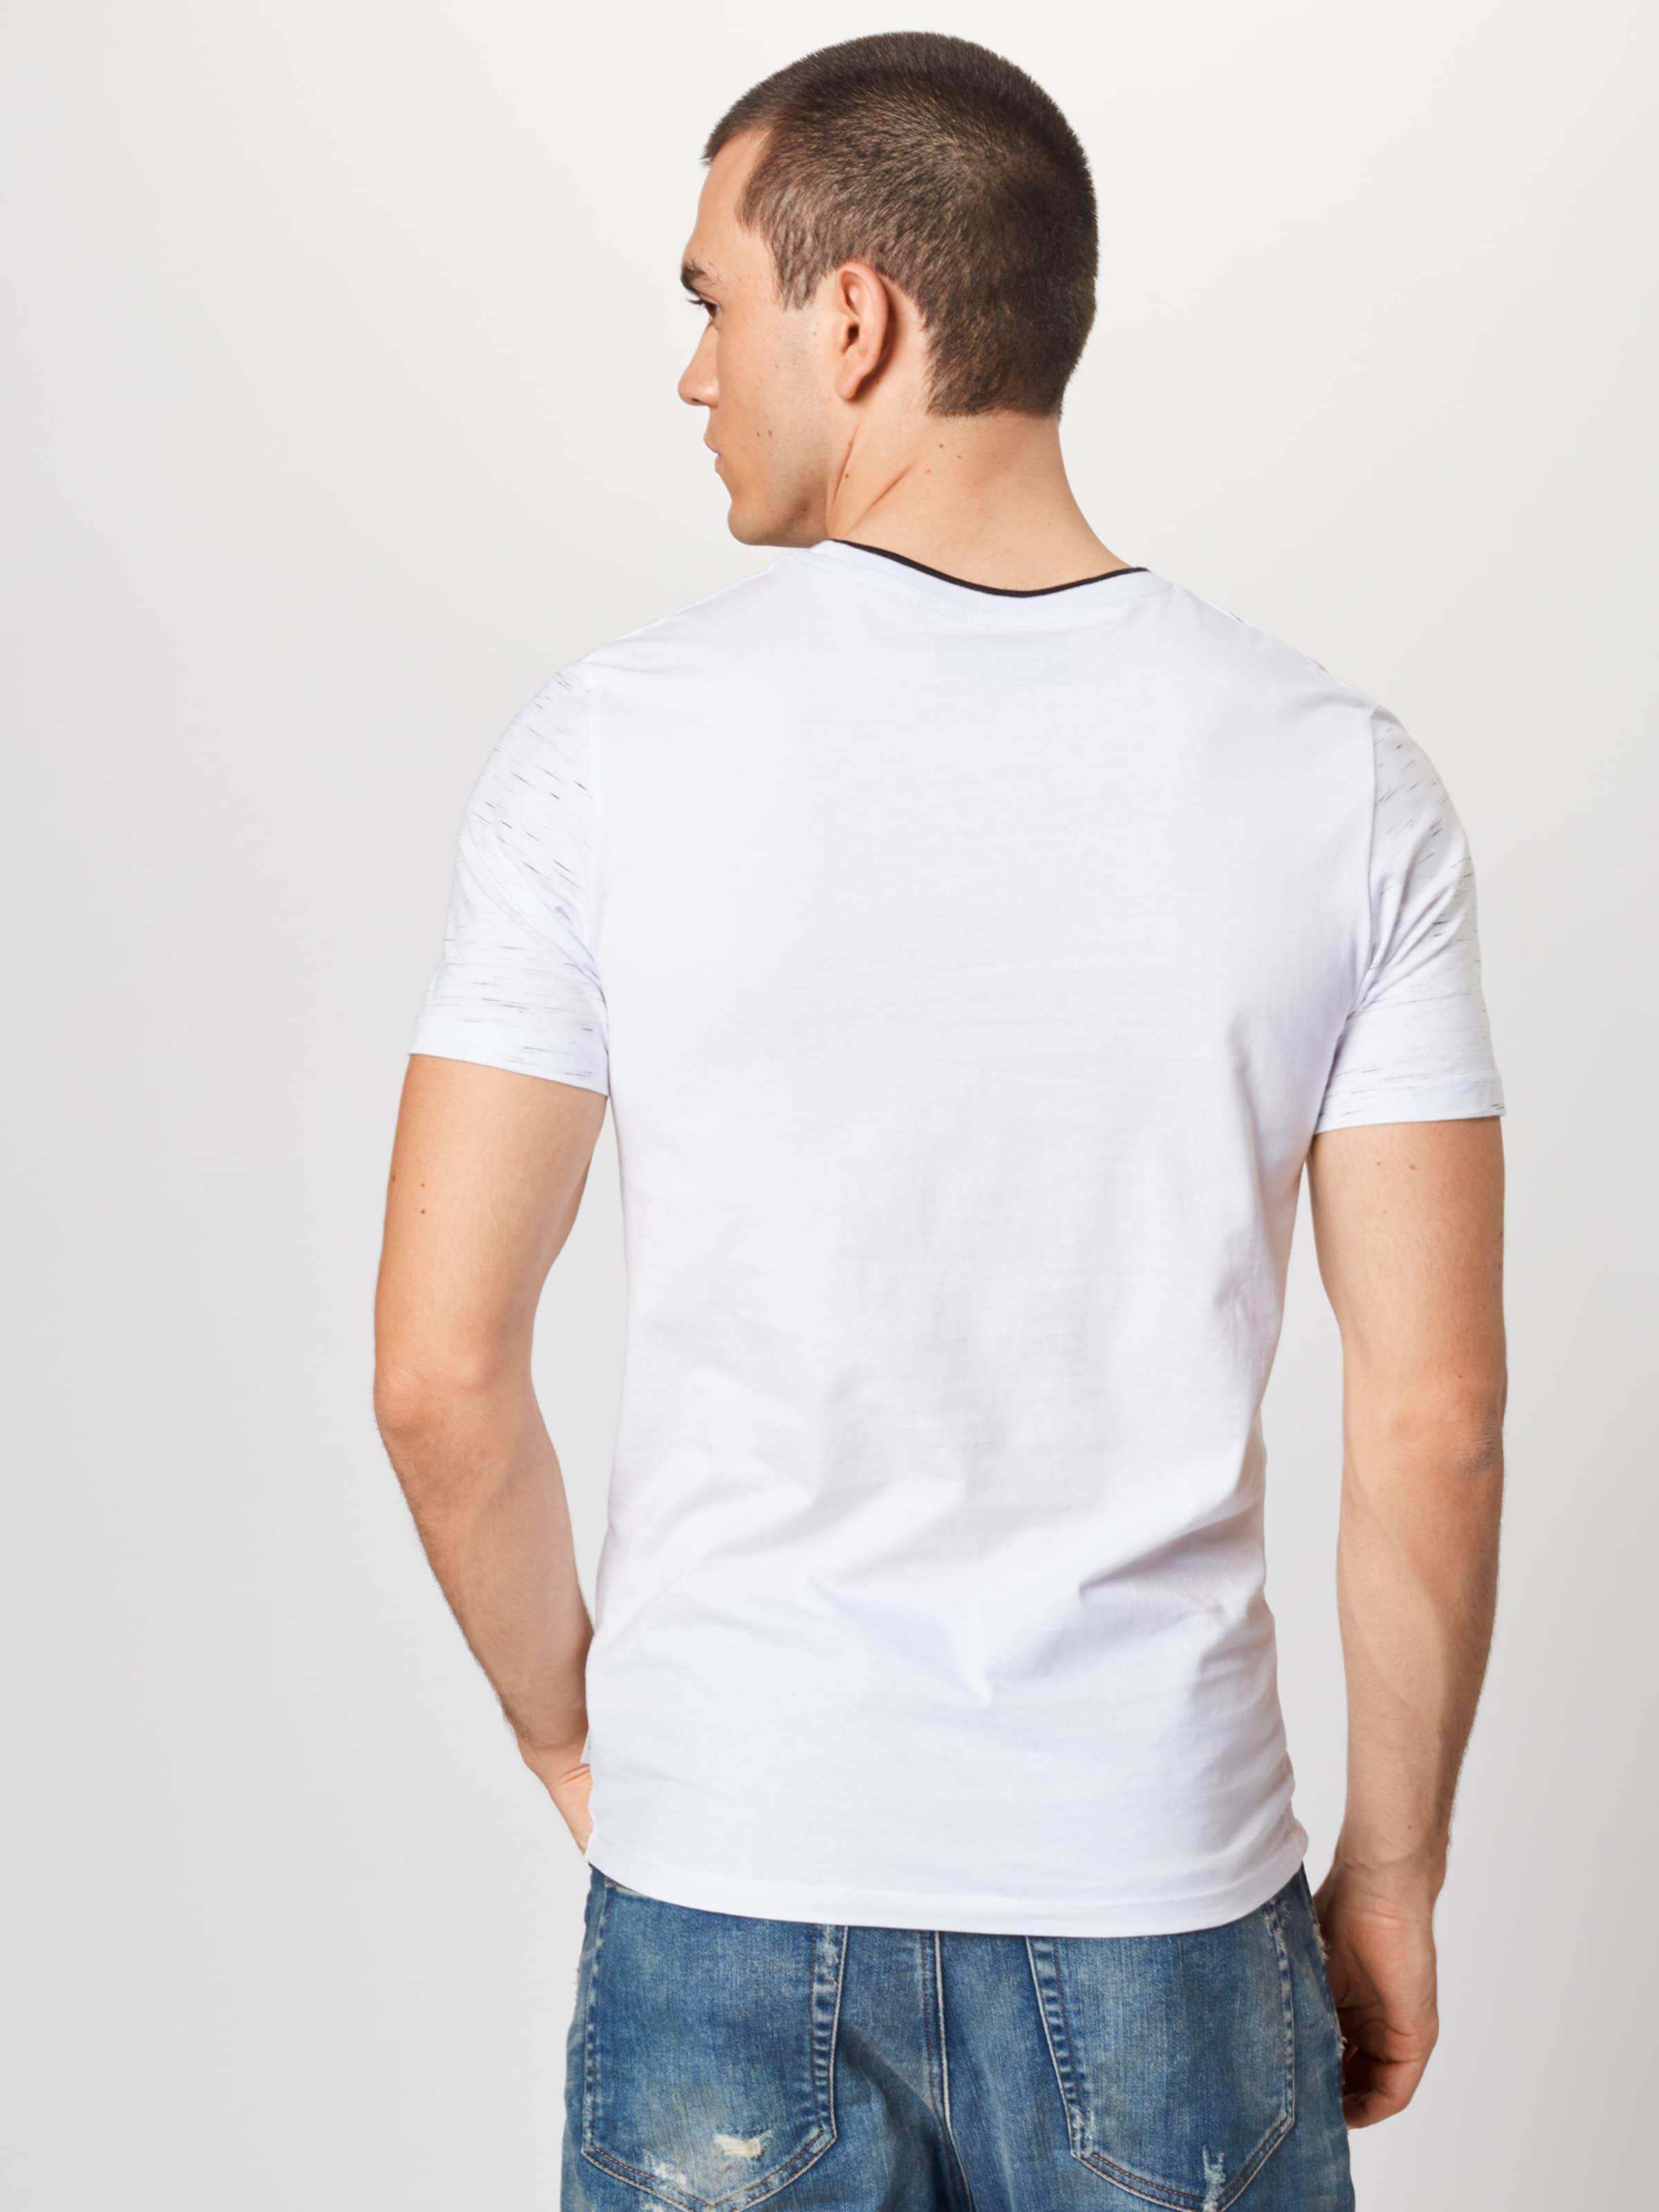 In Shirt Weiß Jackamp; 'frank' Jones q35RLj4A